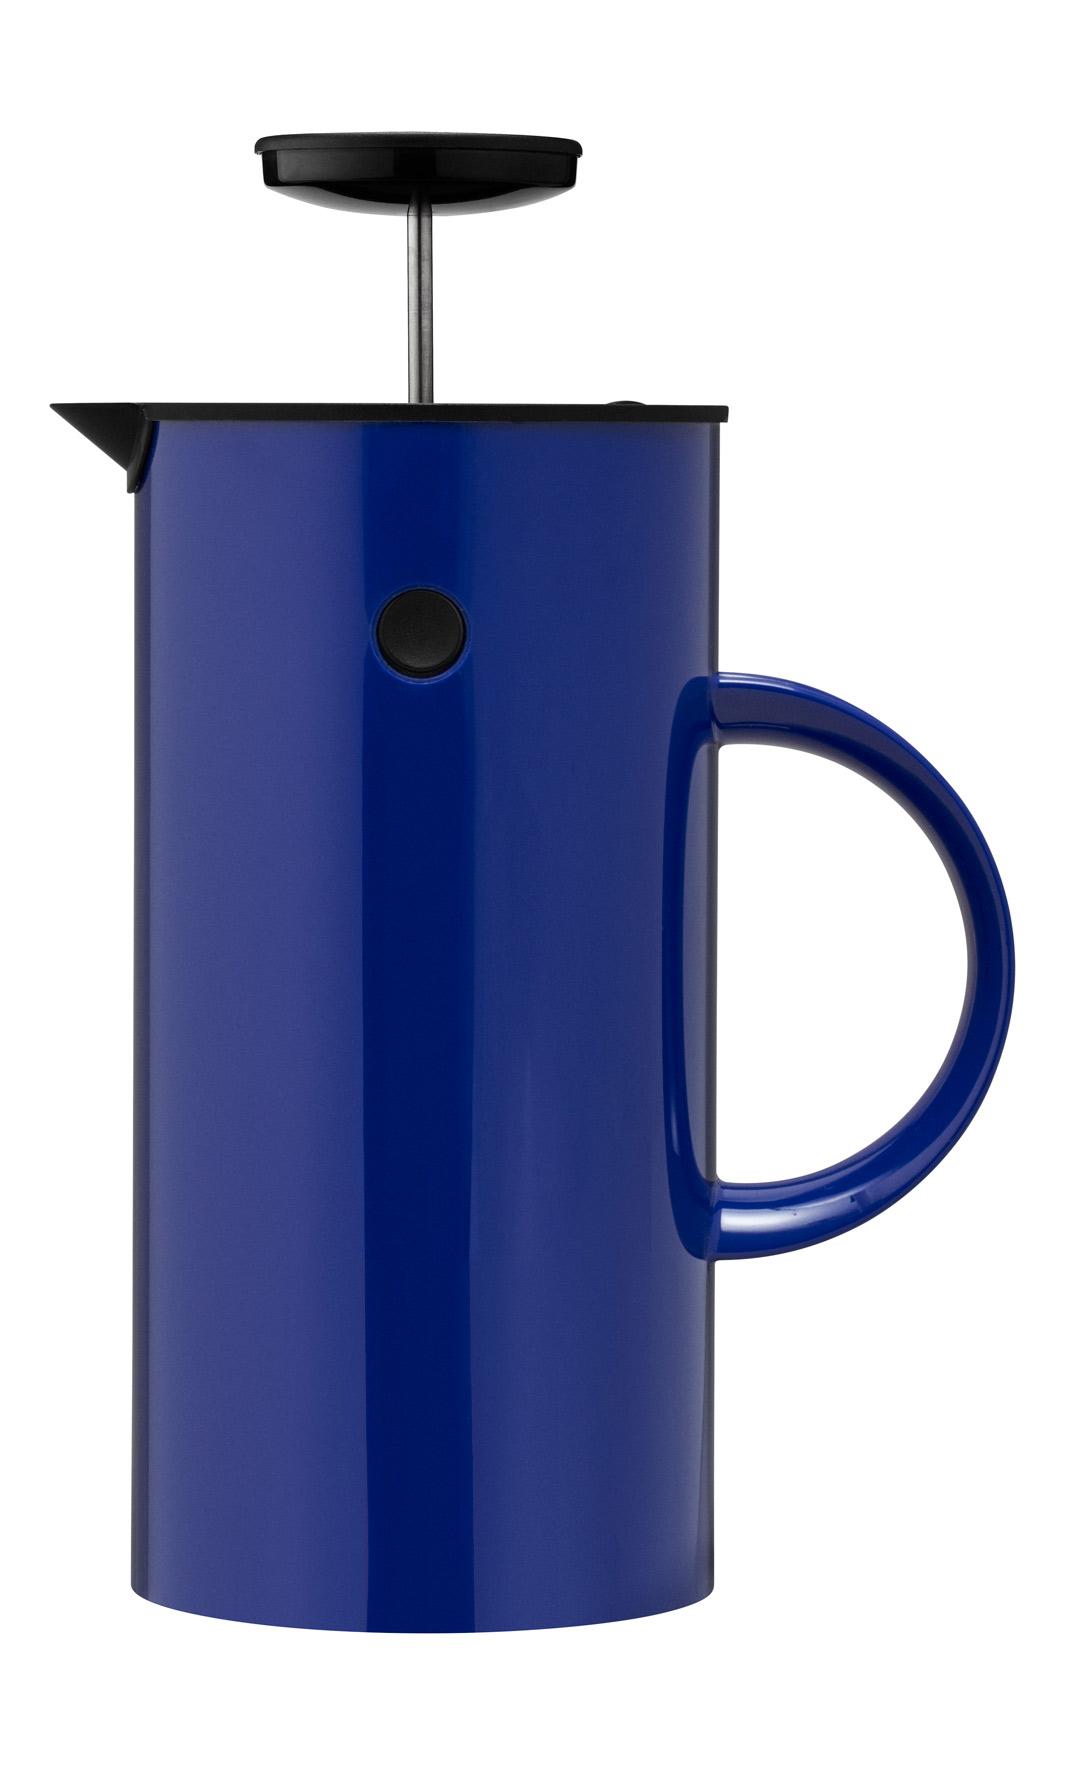 Stelton EM Kaffepresse 1 liter Ultramarine